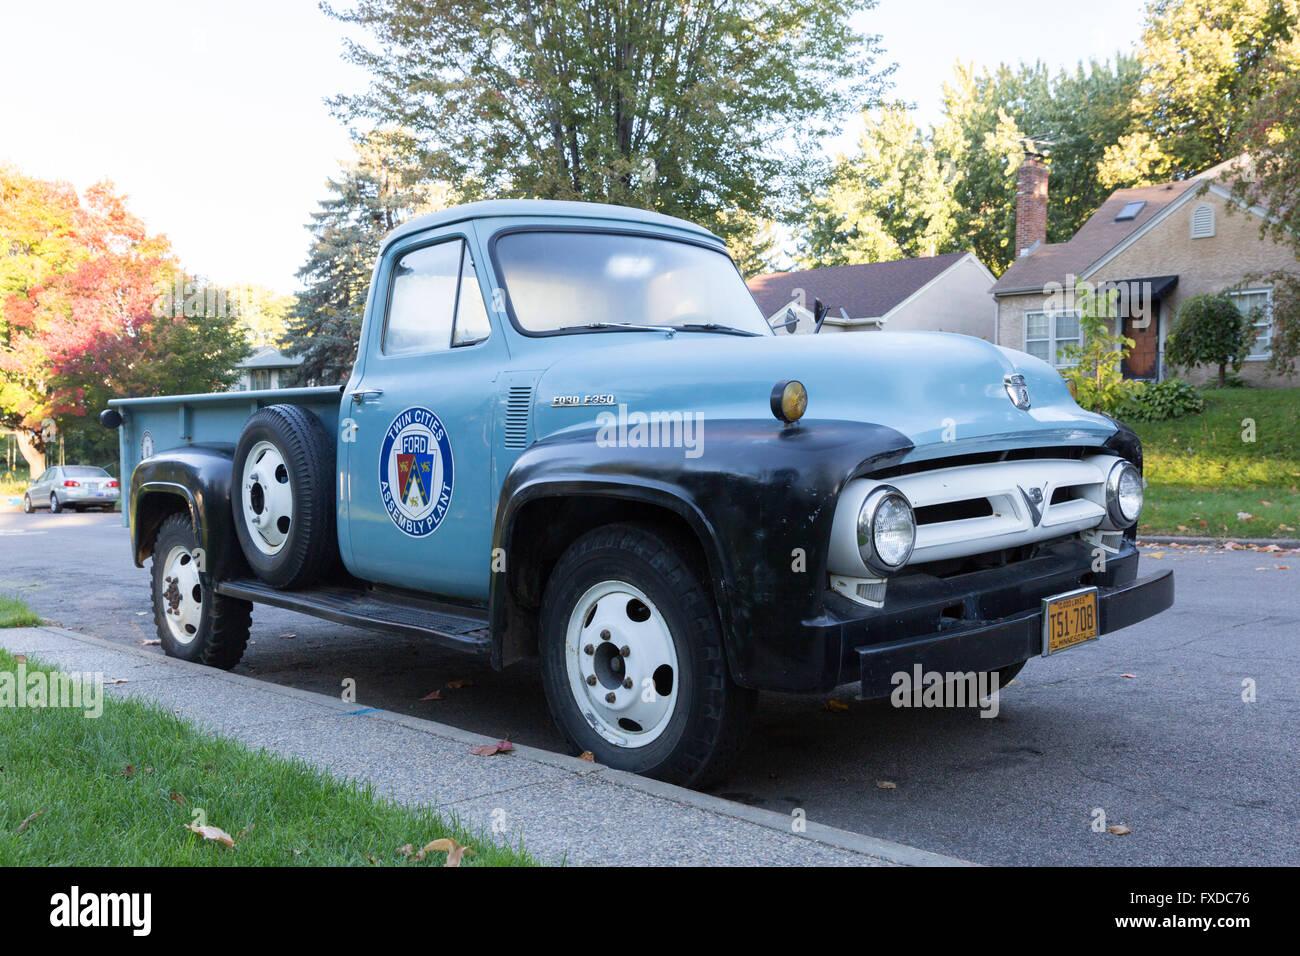 Classic Pickup Trucks Stock Photos & Classic Pickup Trucks Stock ...